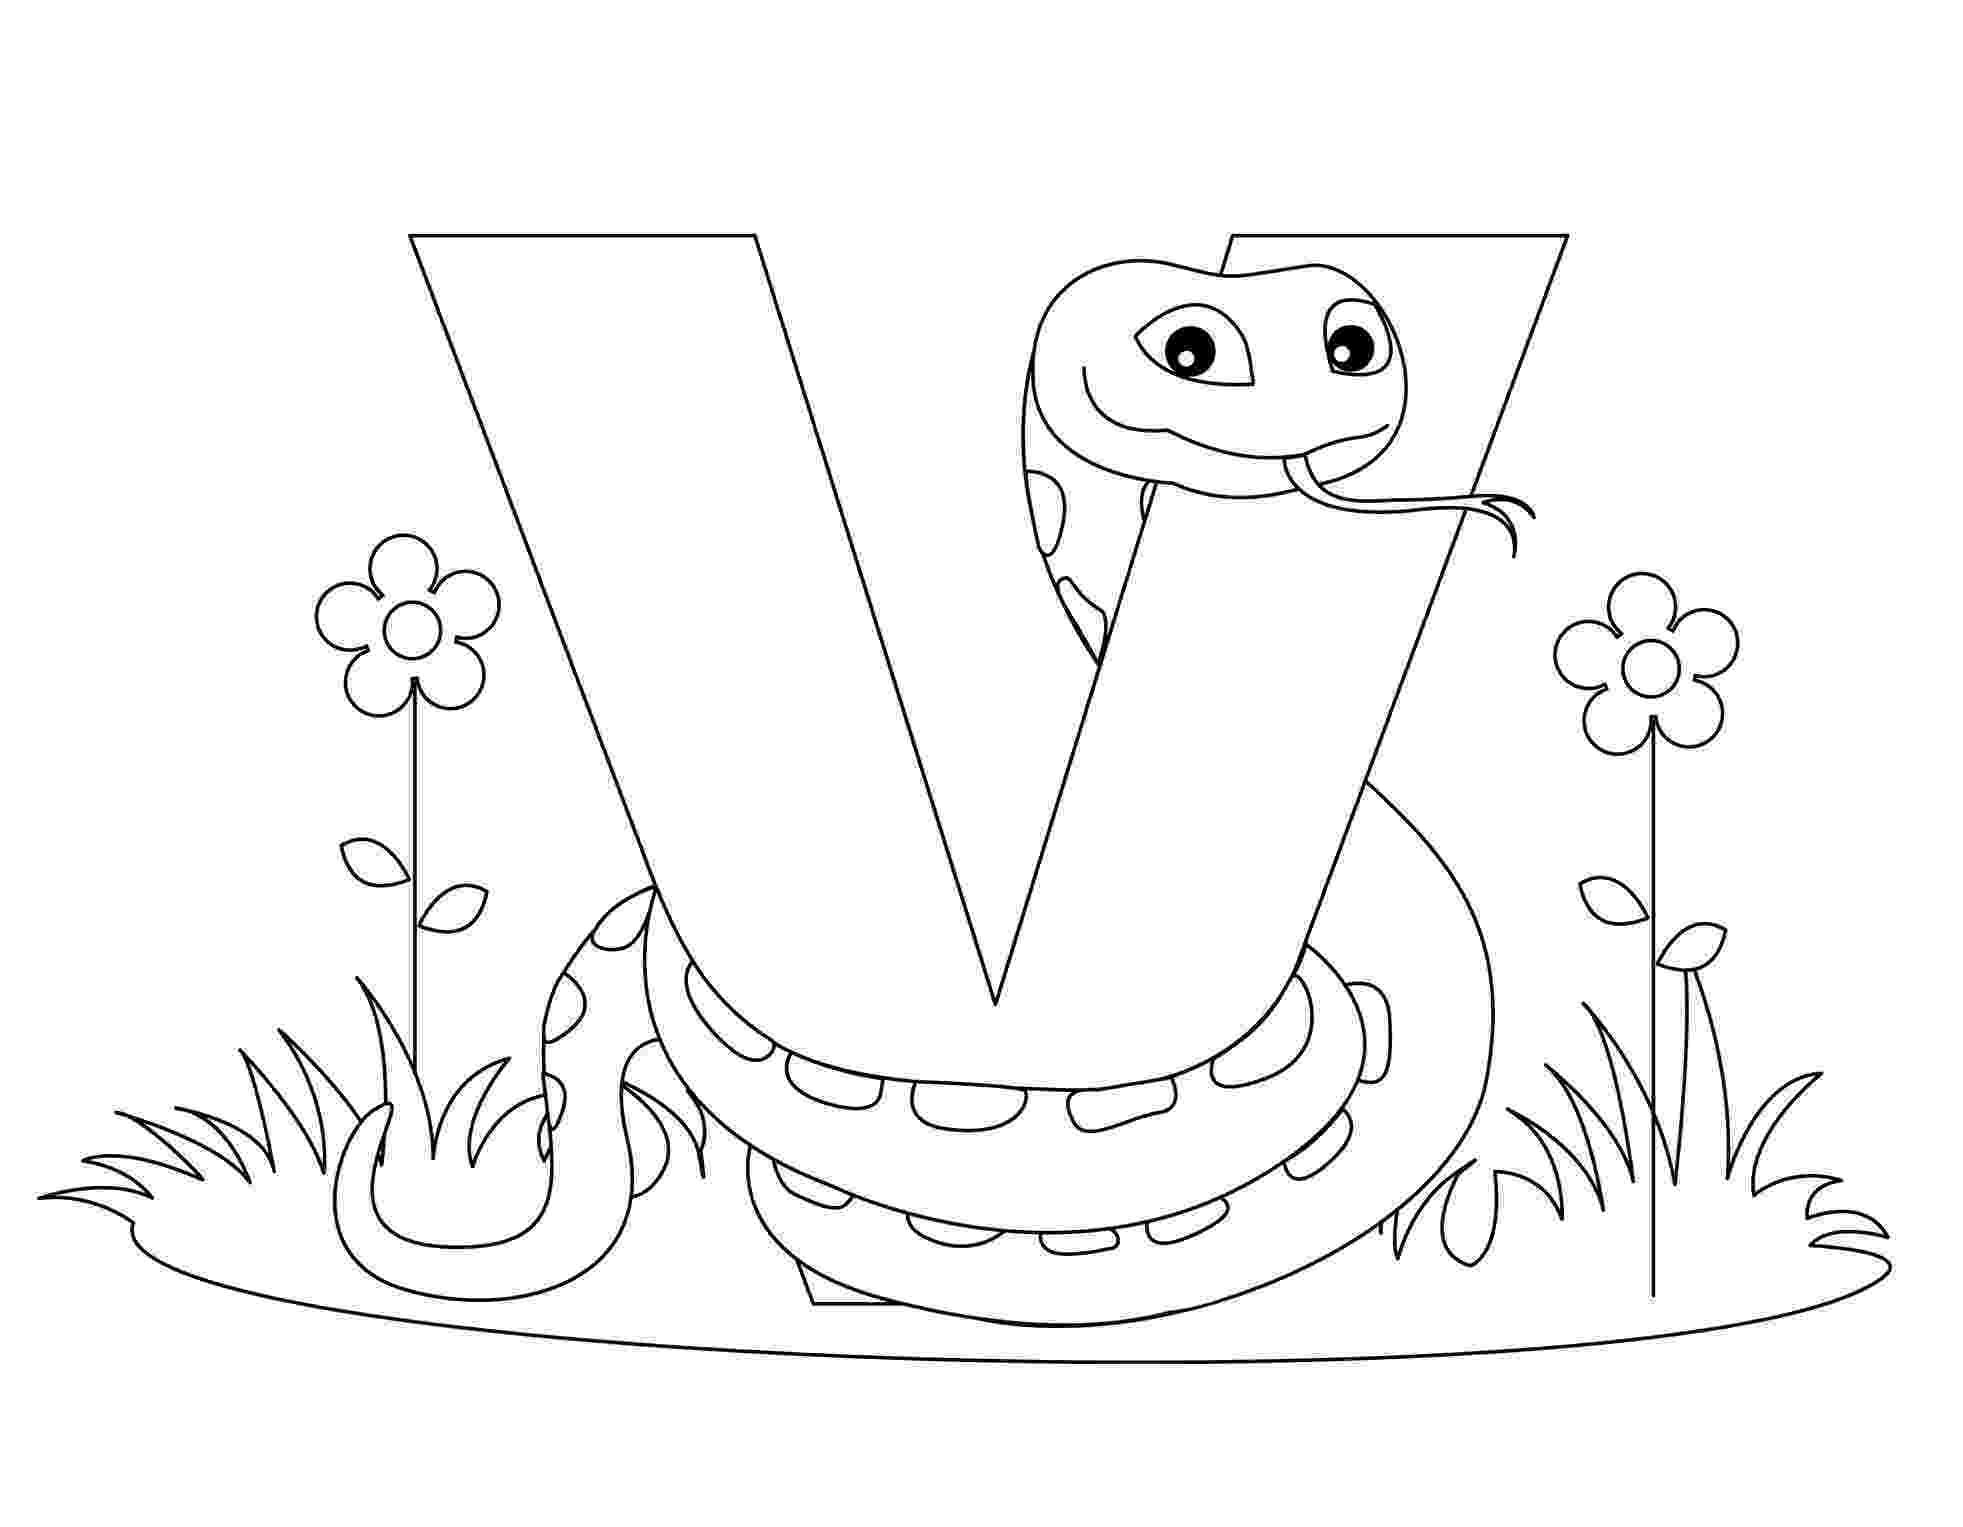 alphabet coloring worksheets free printable alphabet coloring pages for kids best alphabet coloring worksheets 1 1